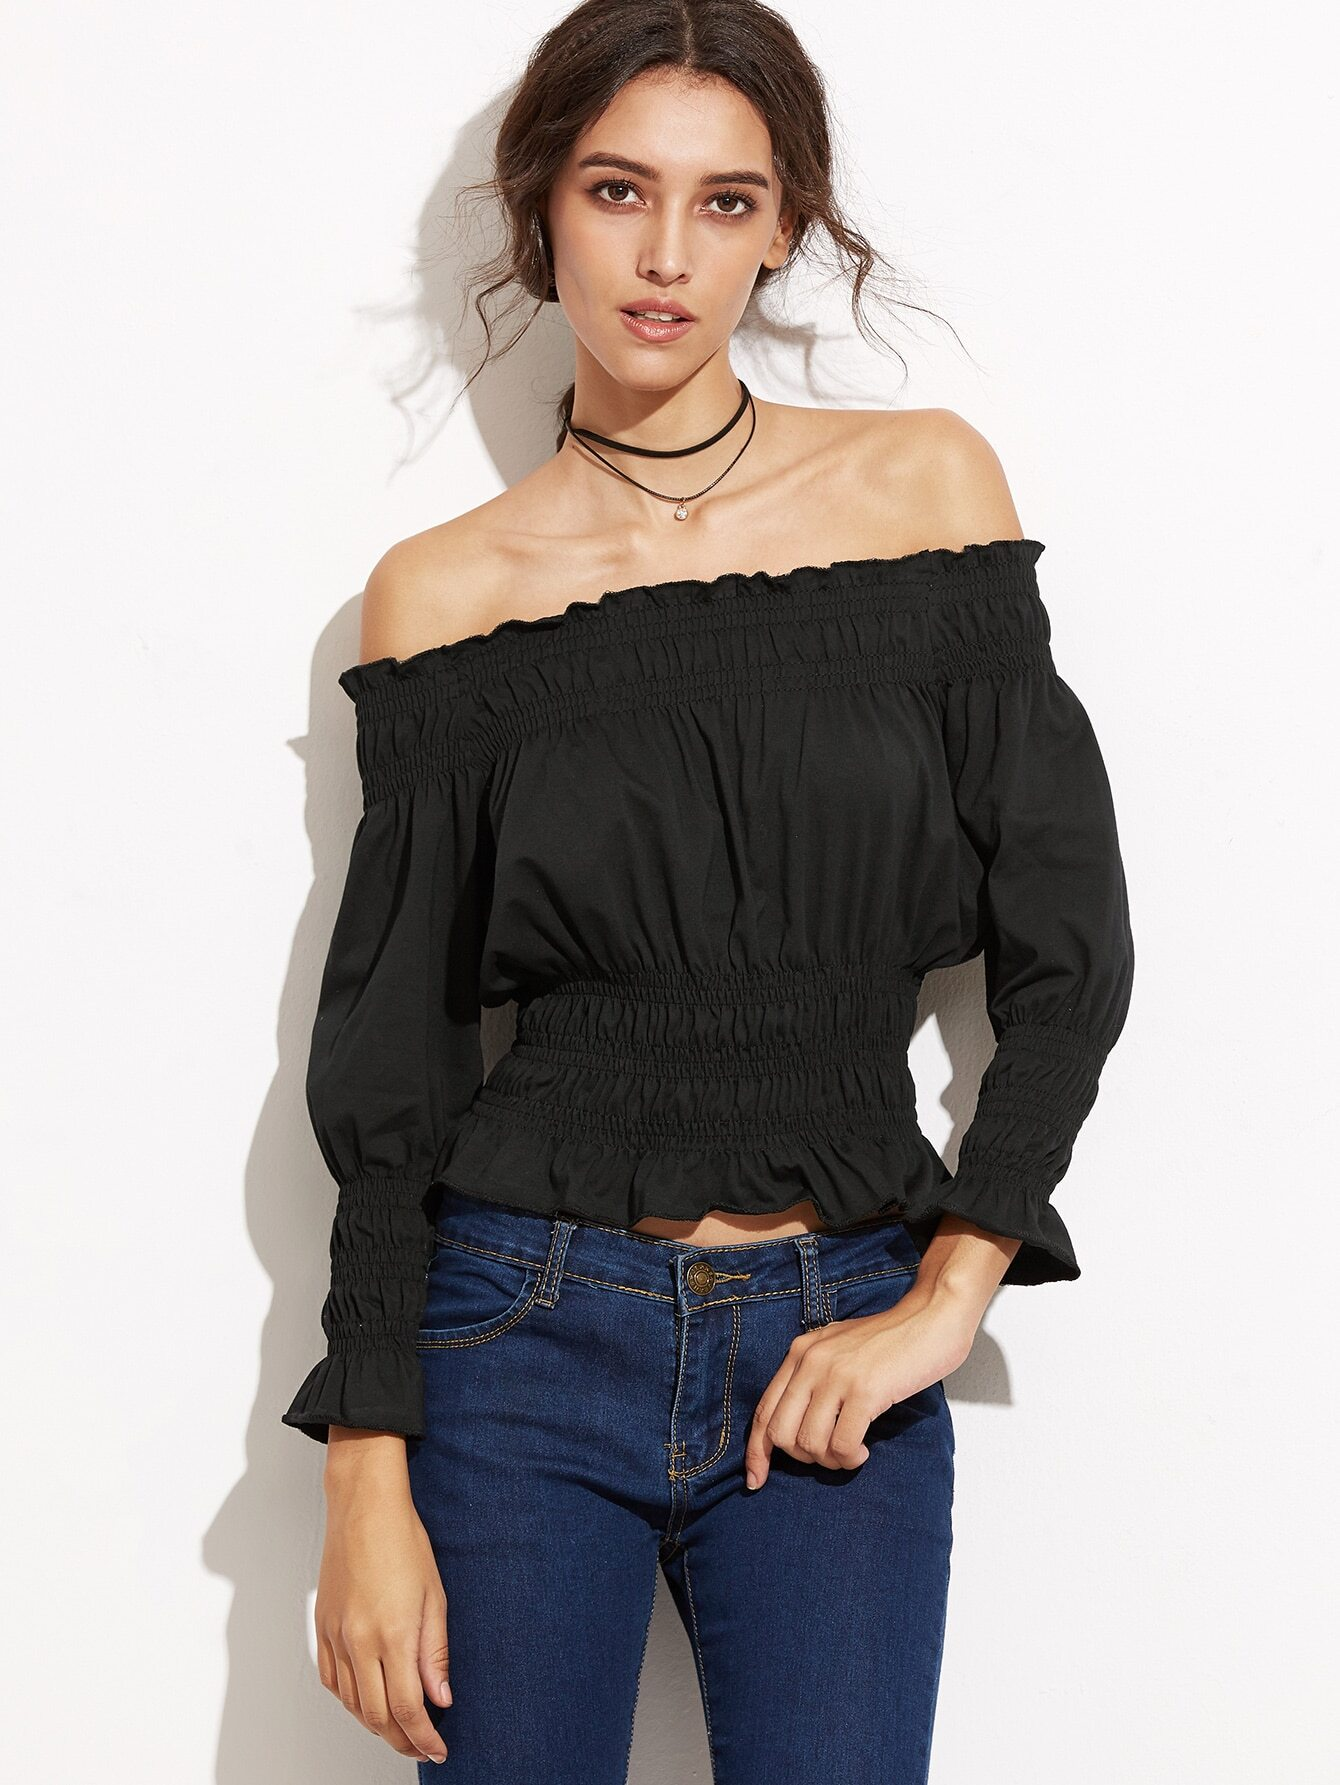 blouse160831124_2